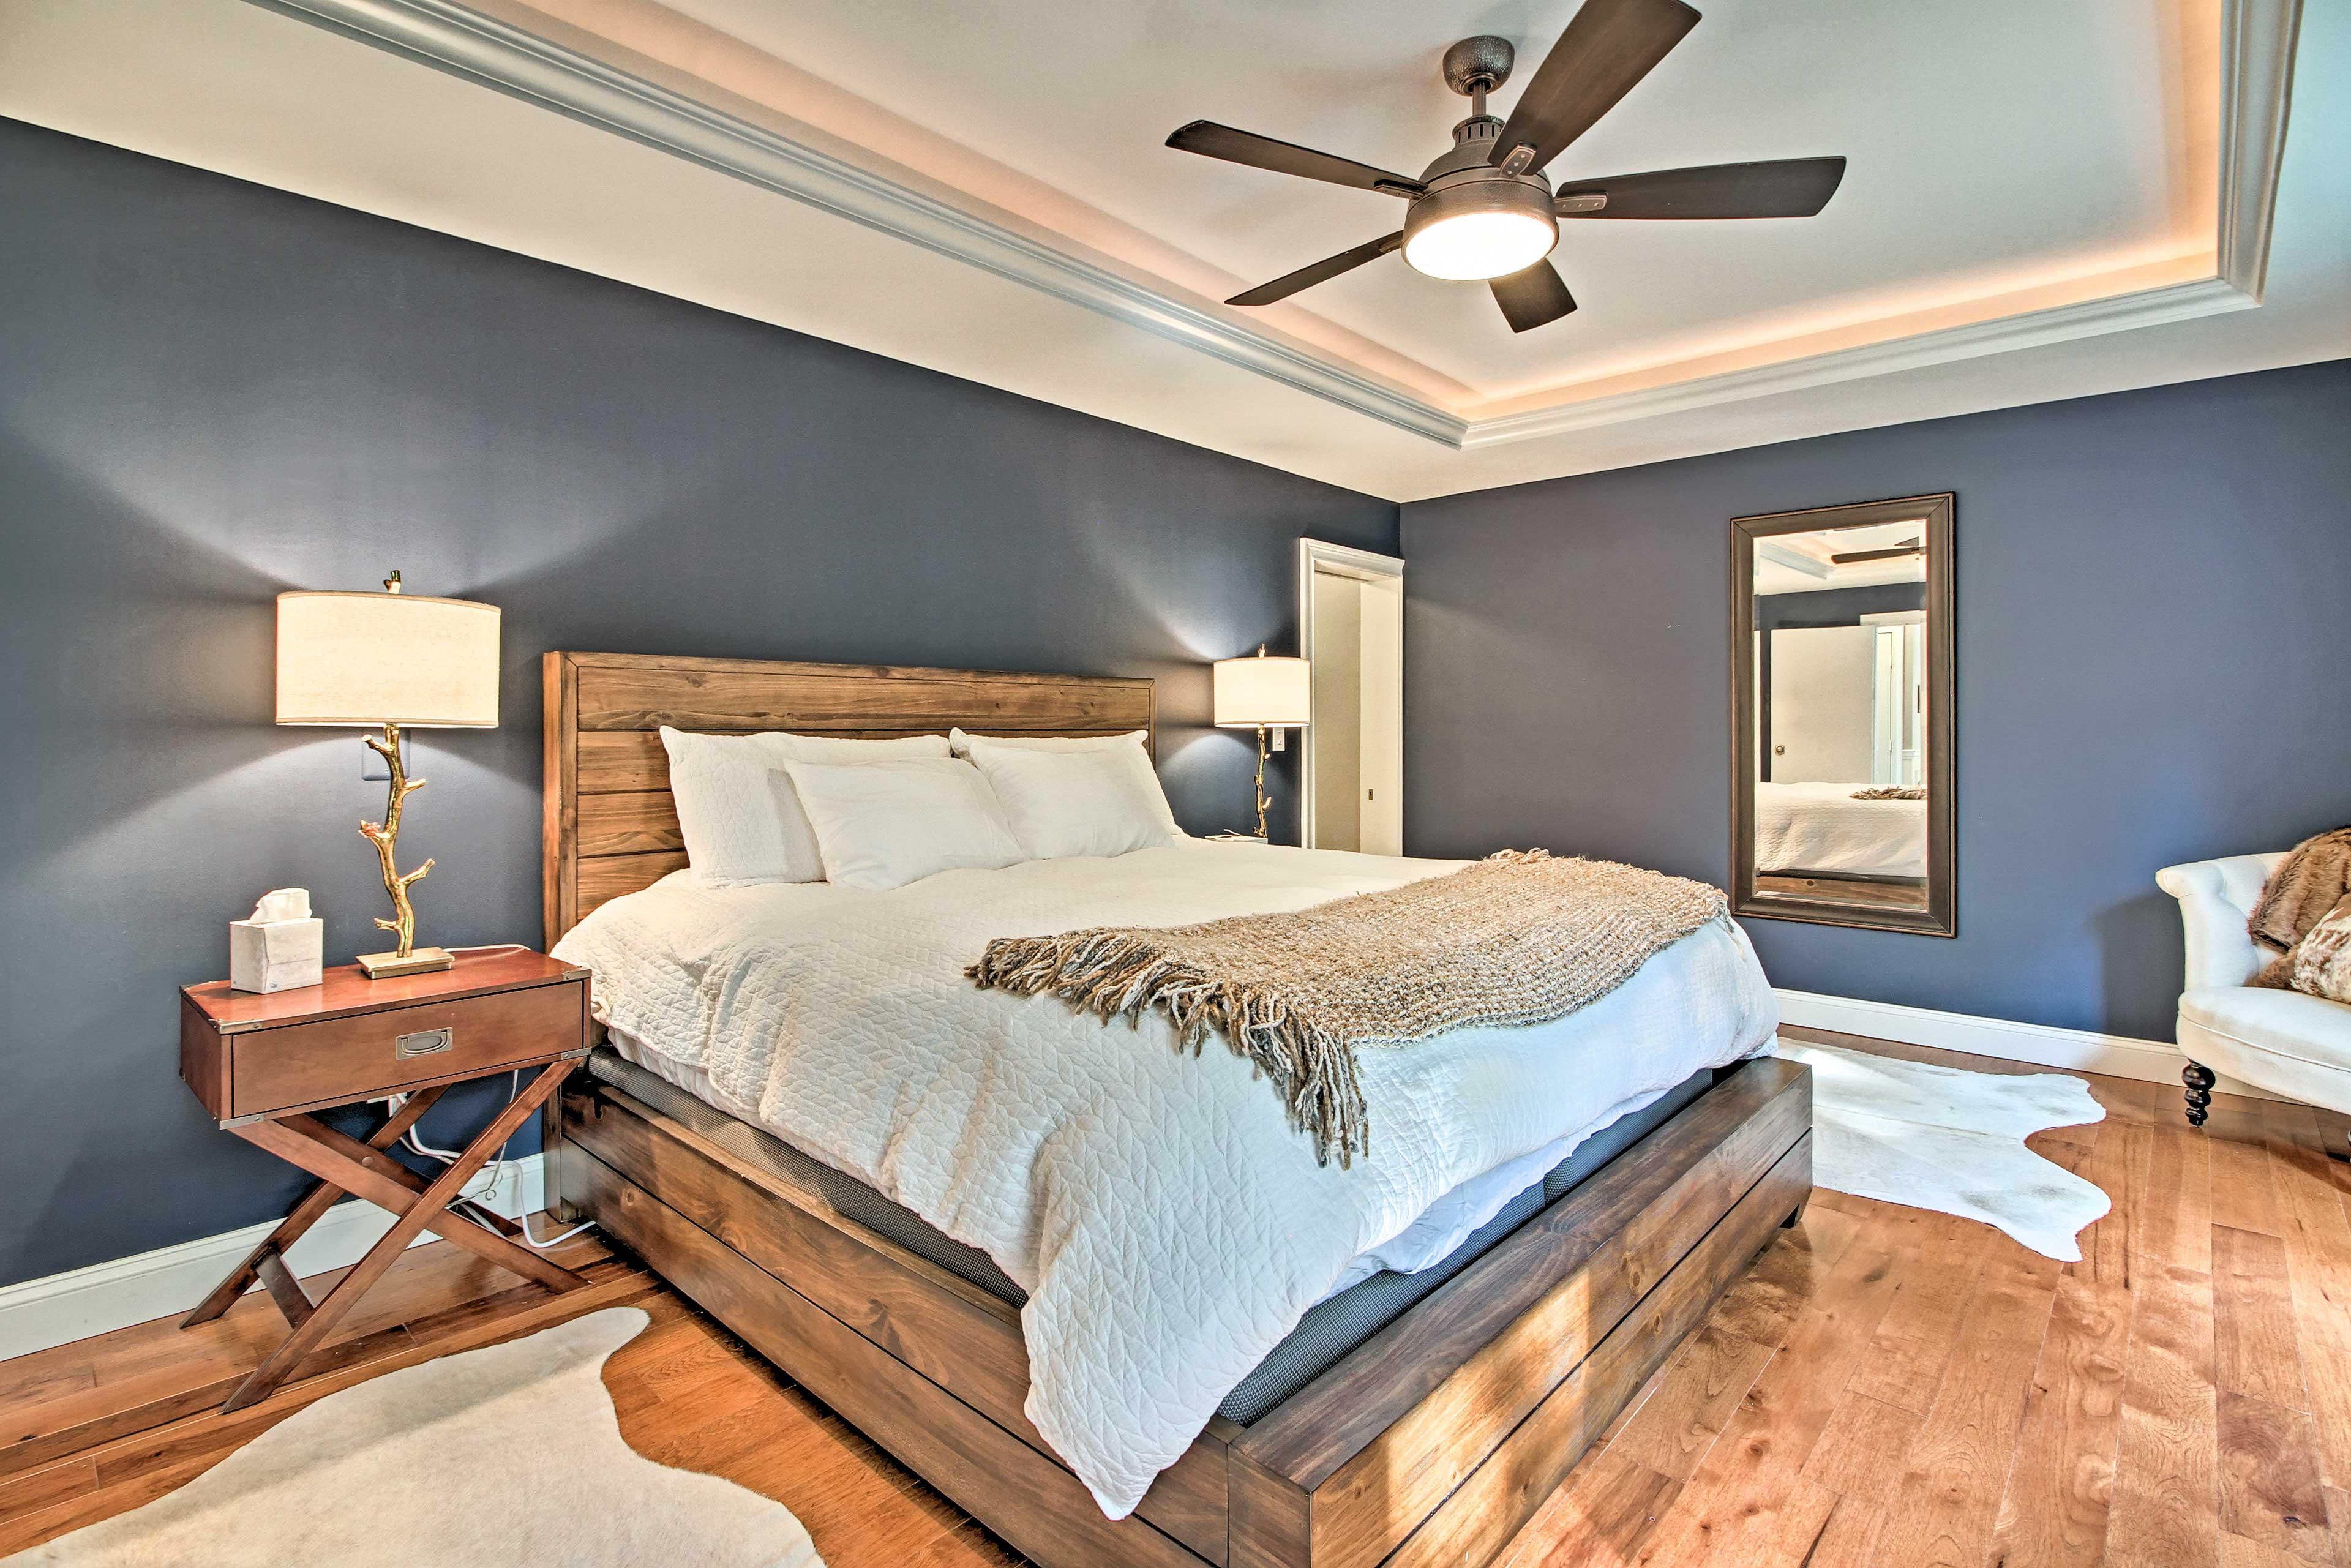 Unique decor fills each room.